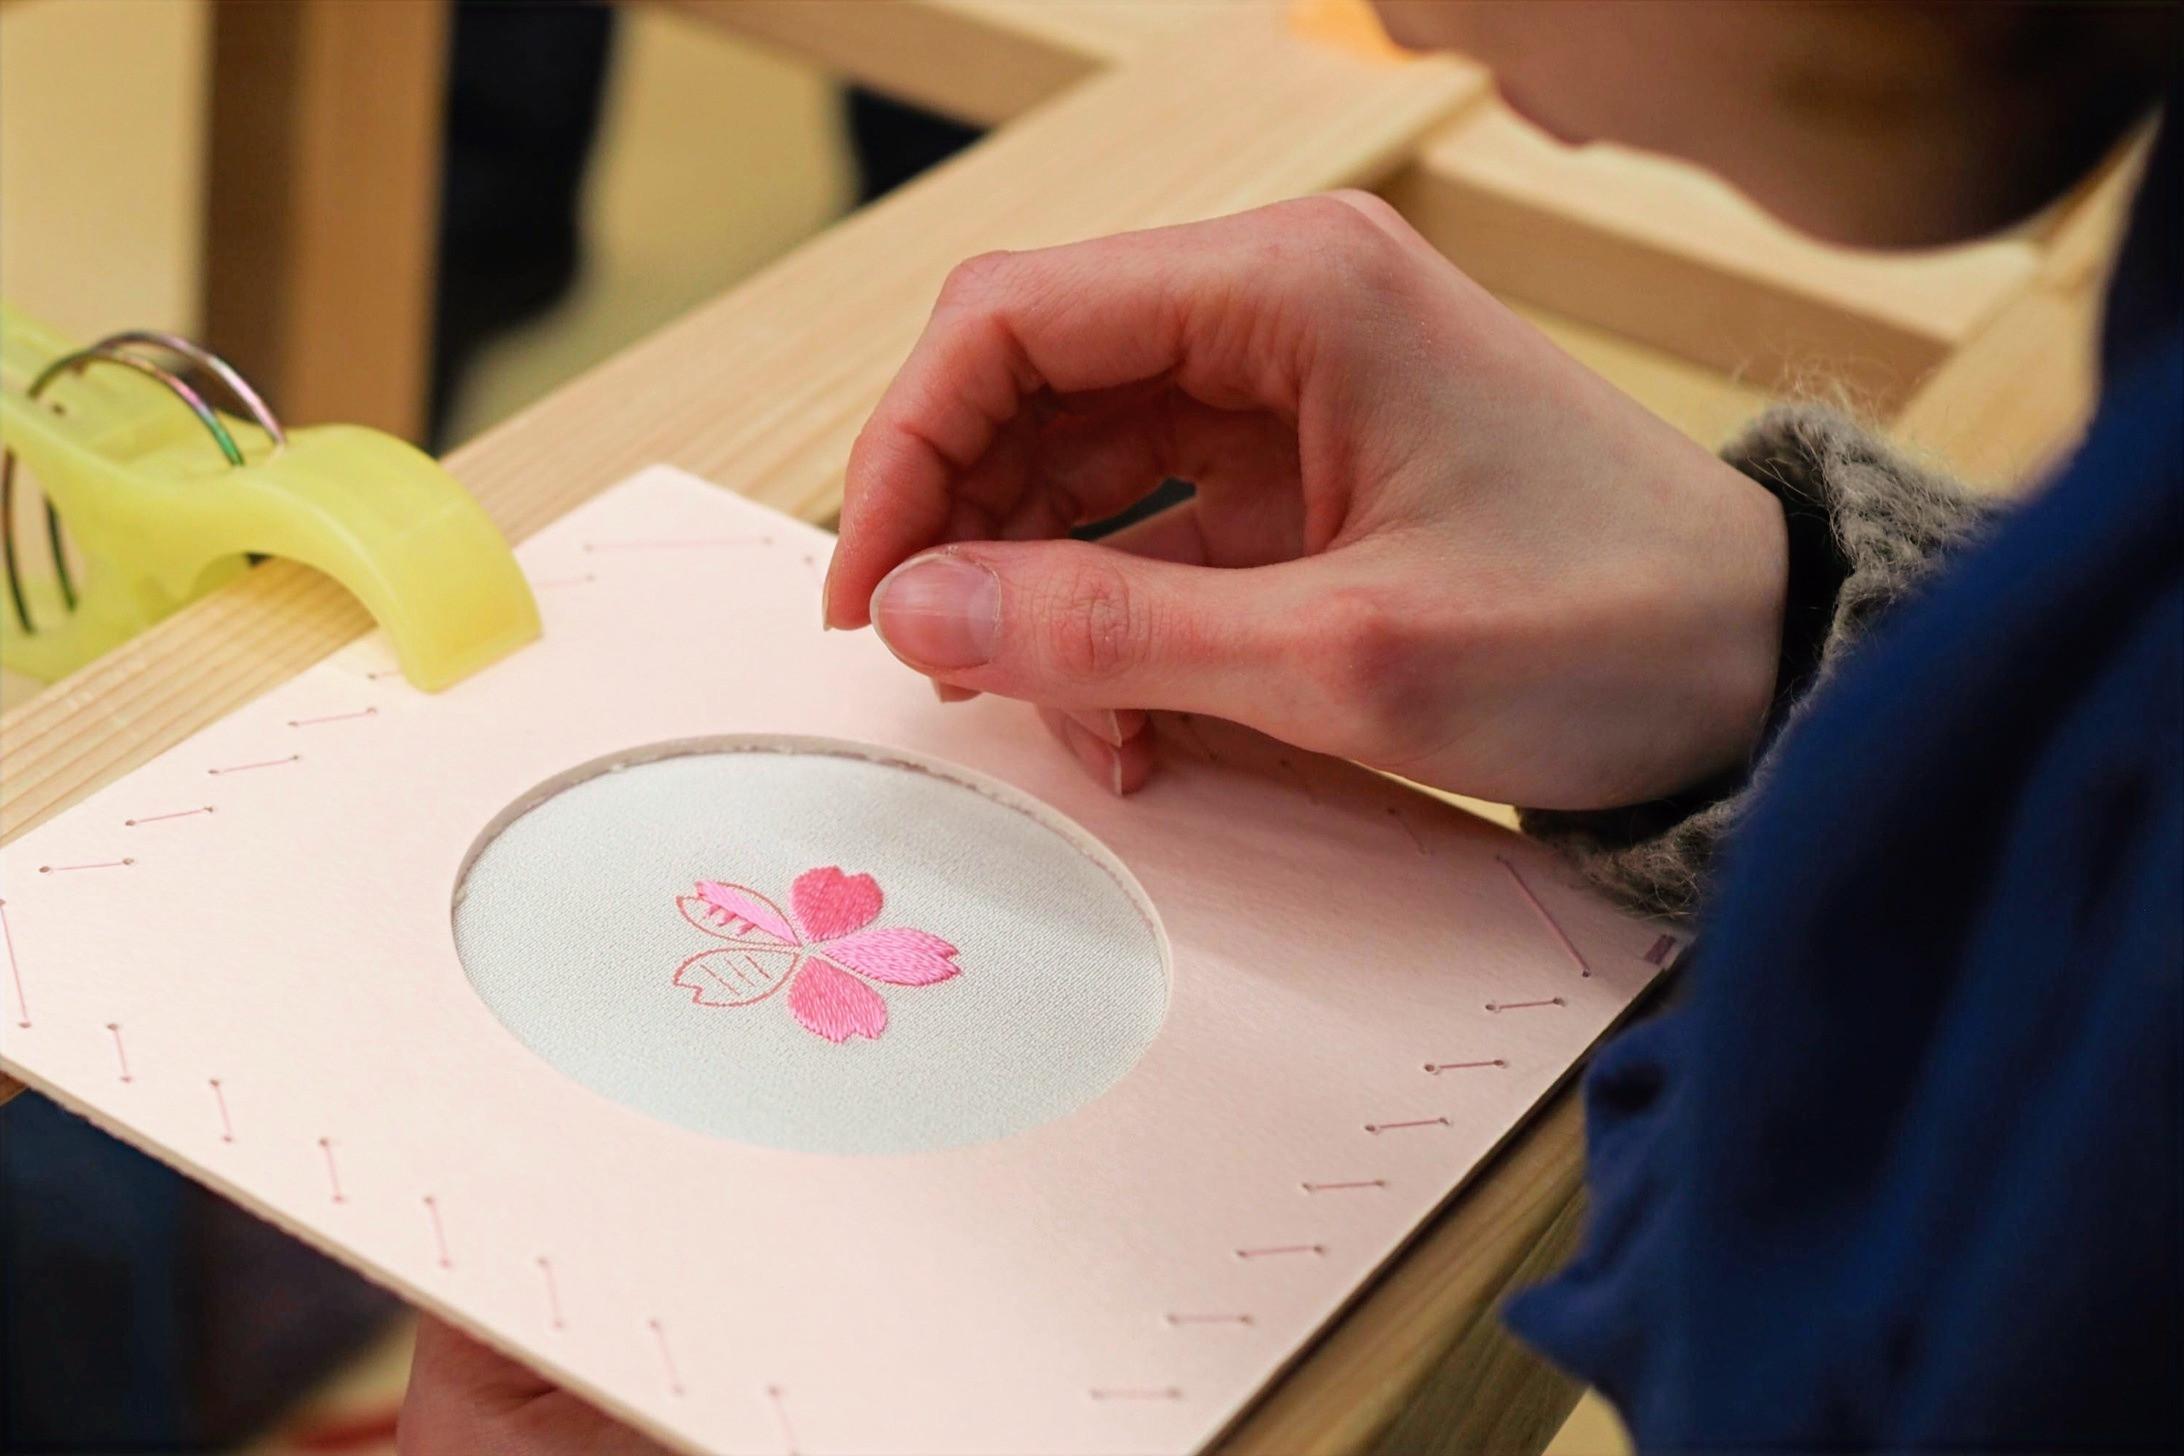 Nagasaki Embroidery Sewing Workshop